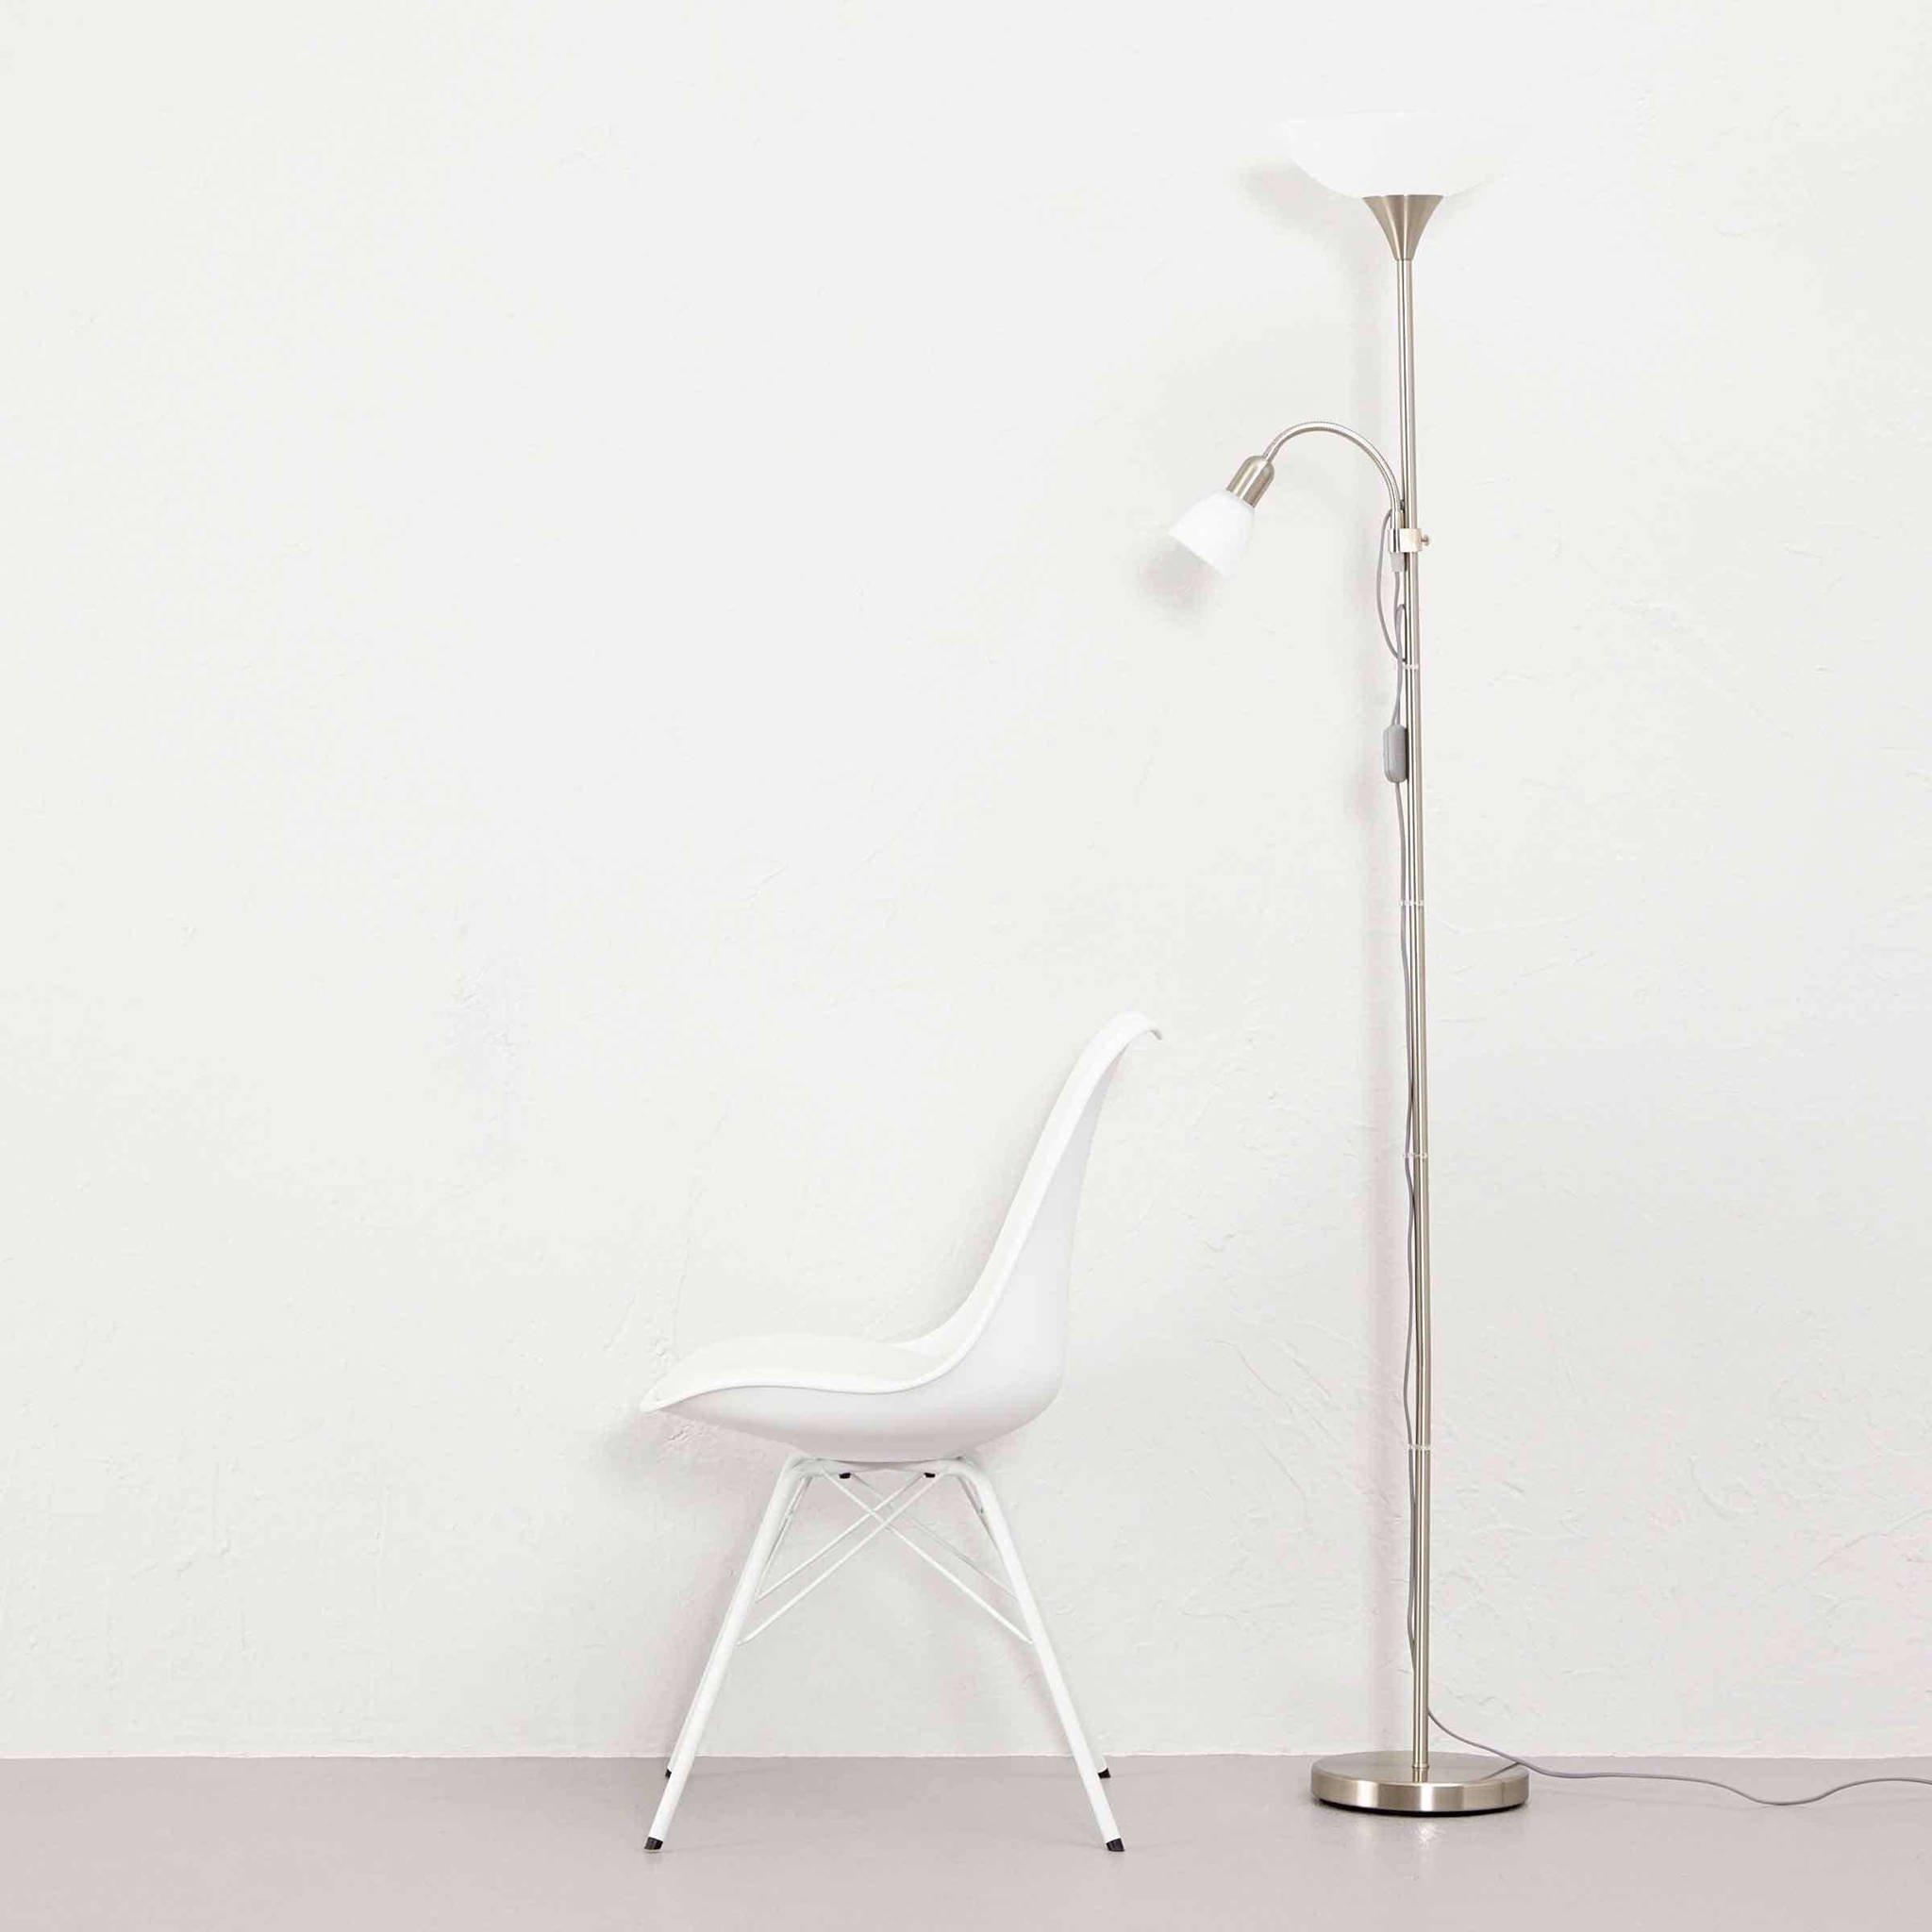 Beroemd EGLO Eglo vloerlamp | wehkamp VA94